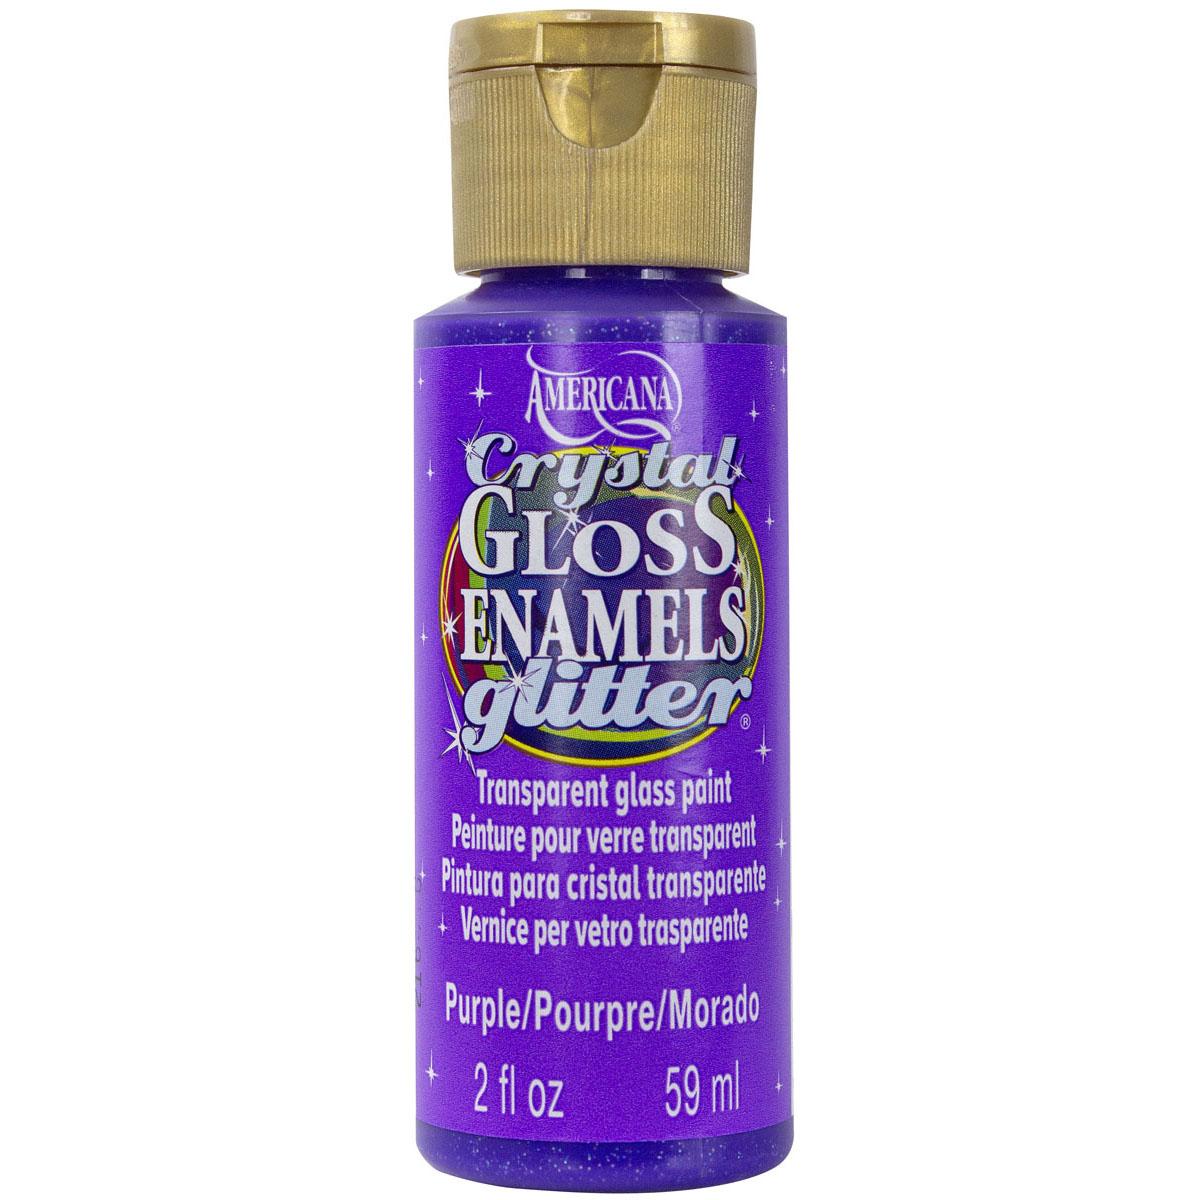 Americana Gloss Enamels Crystal Glitter Acrylic Paint 2oz-Yellow